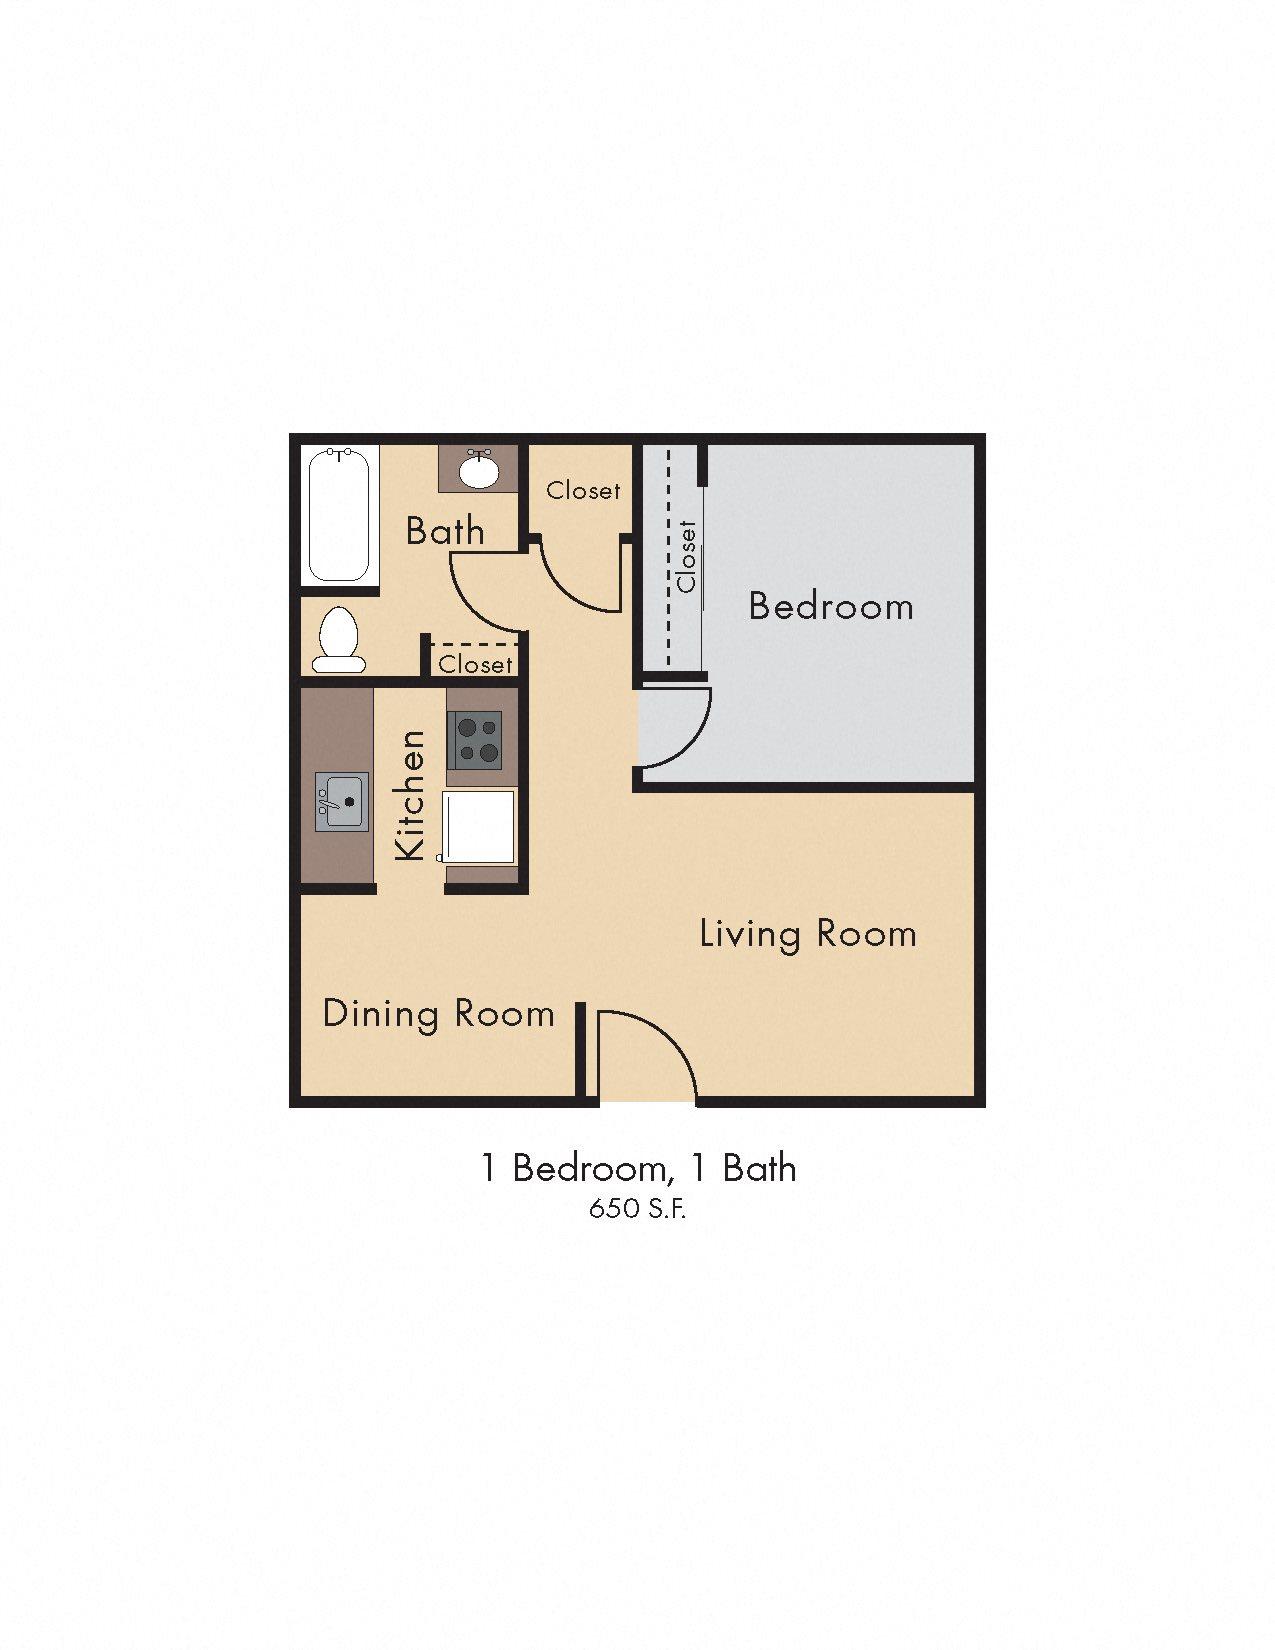 Floor Plans Of Southwest Village Apartments In Reno Nv